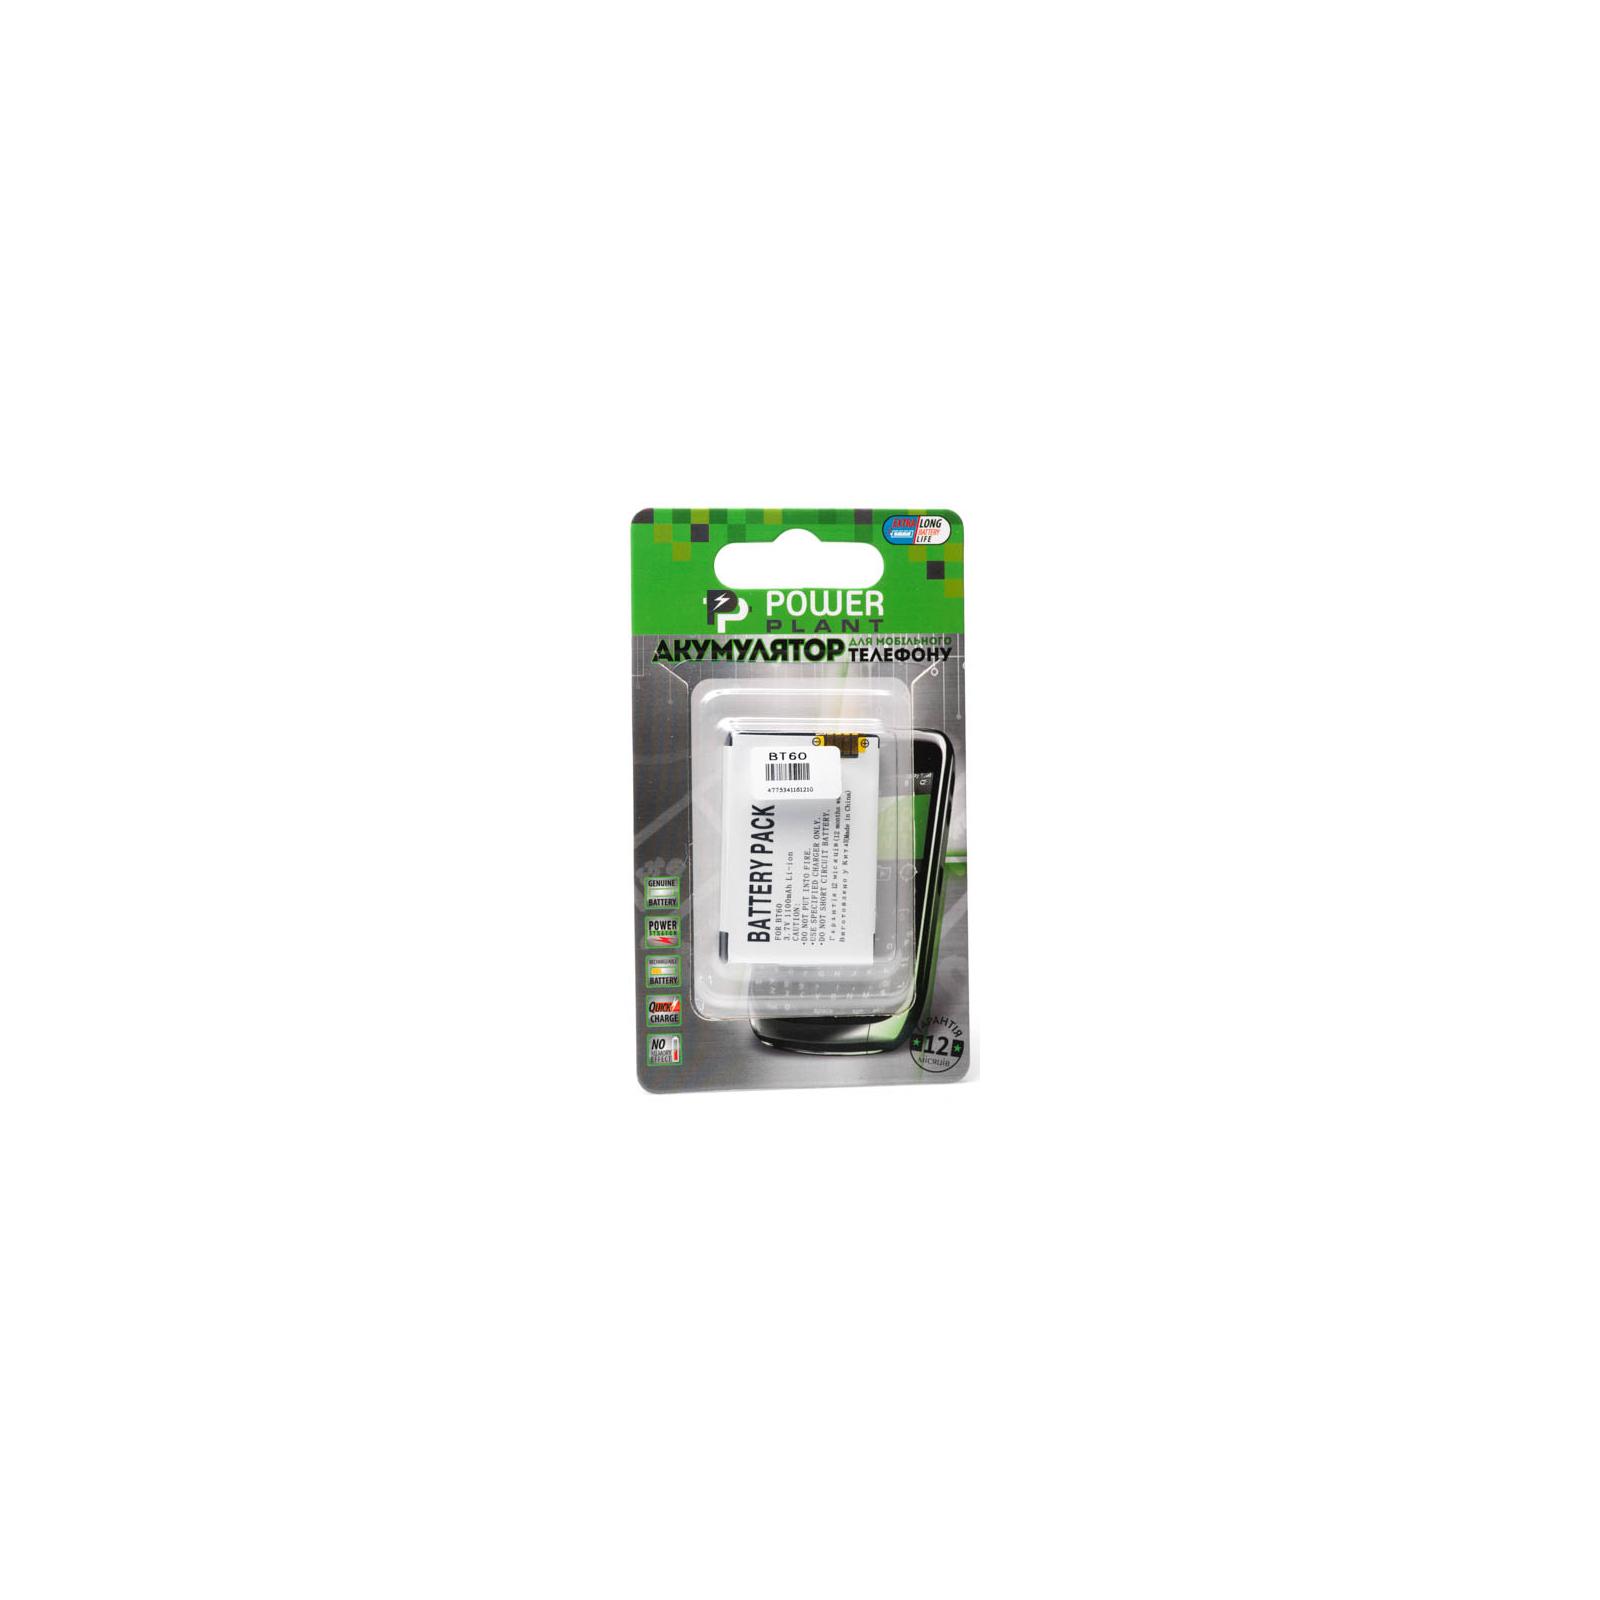 Аккумуляторная батарея PowerPlant Motorola BT60 (C975, V975, E1000, A1010, C168) (DV00DV6121) изображение 2